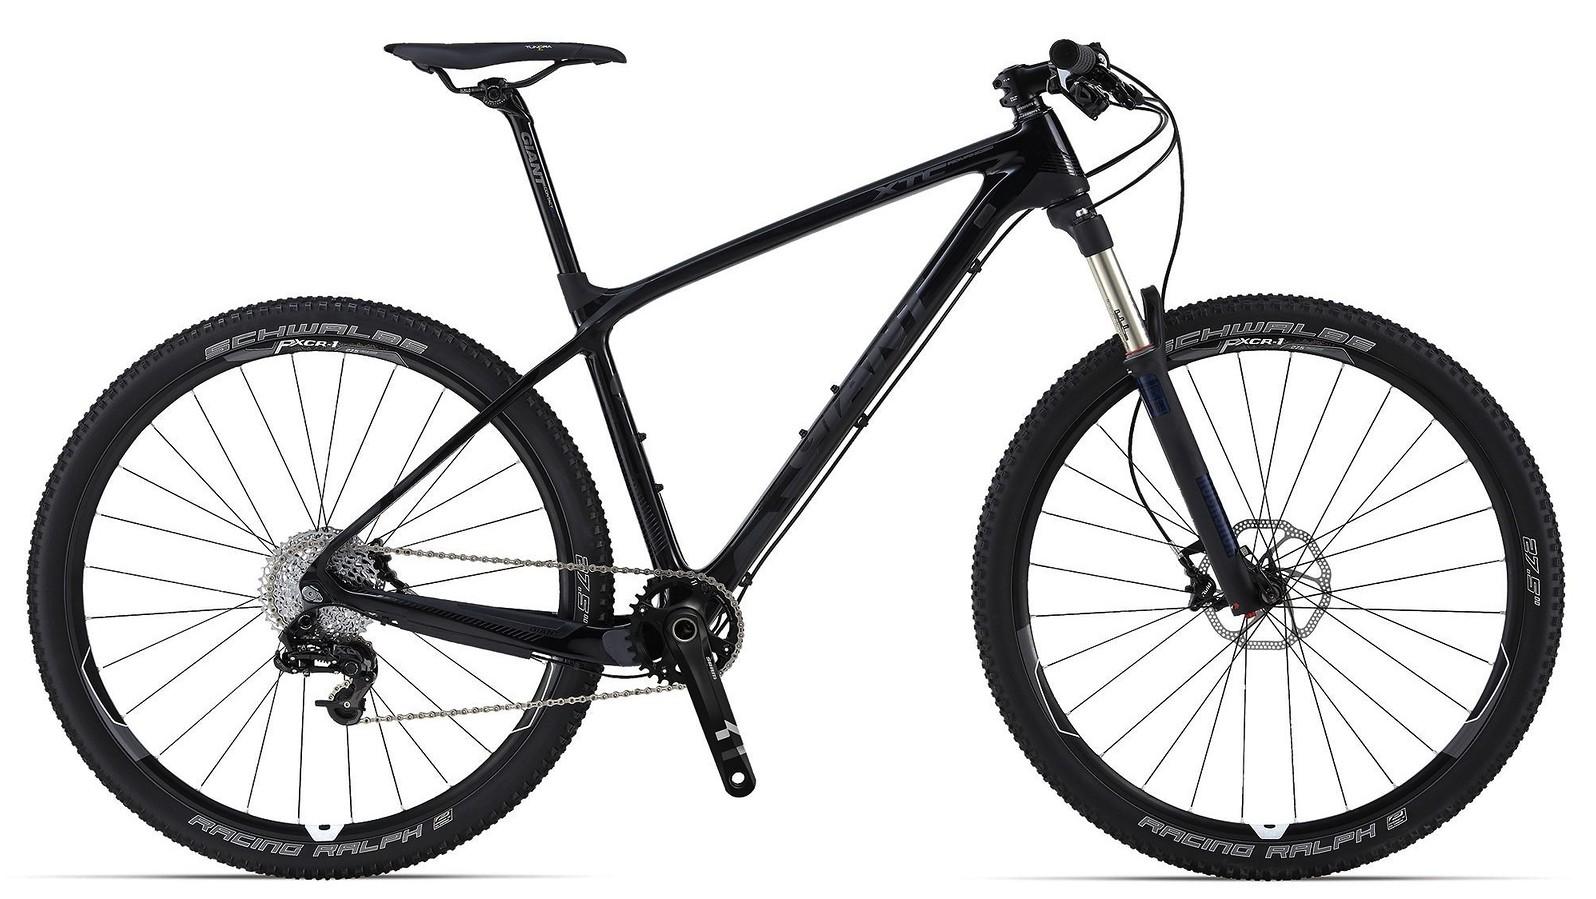 2014 Giant XTC Advanced 27.5 1 Bike XtC_Advanced_27.5_1